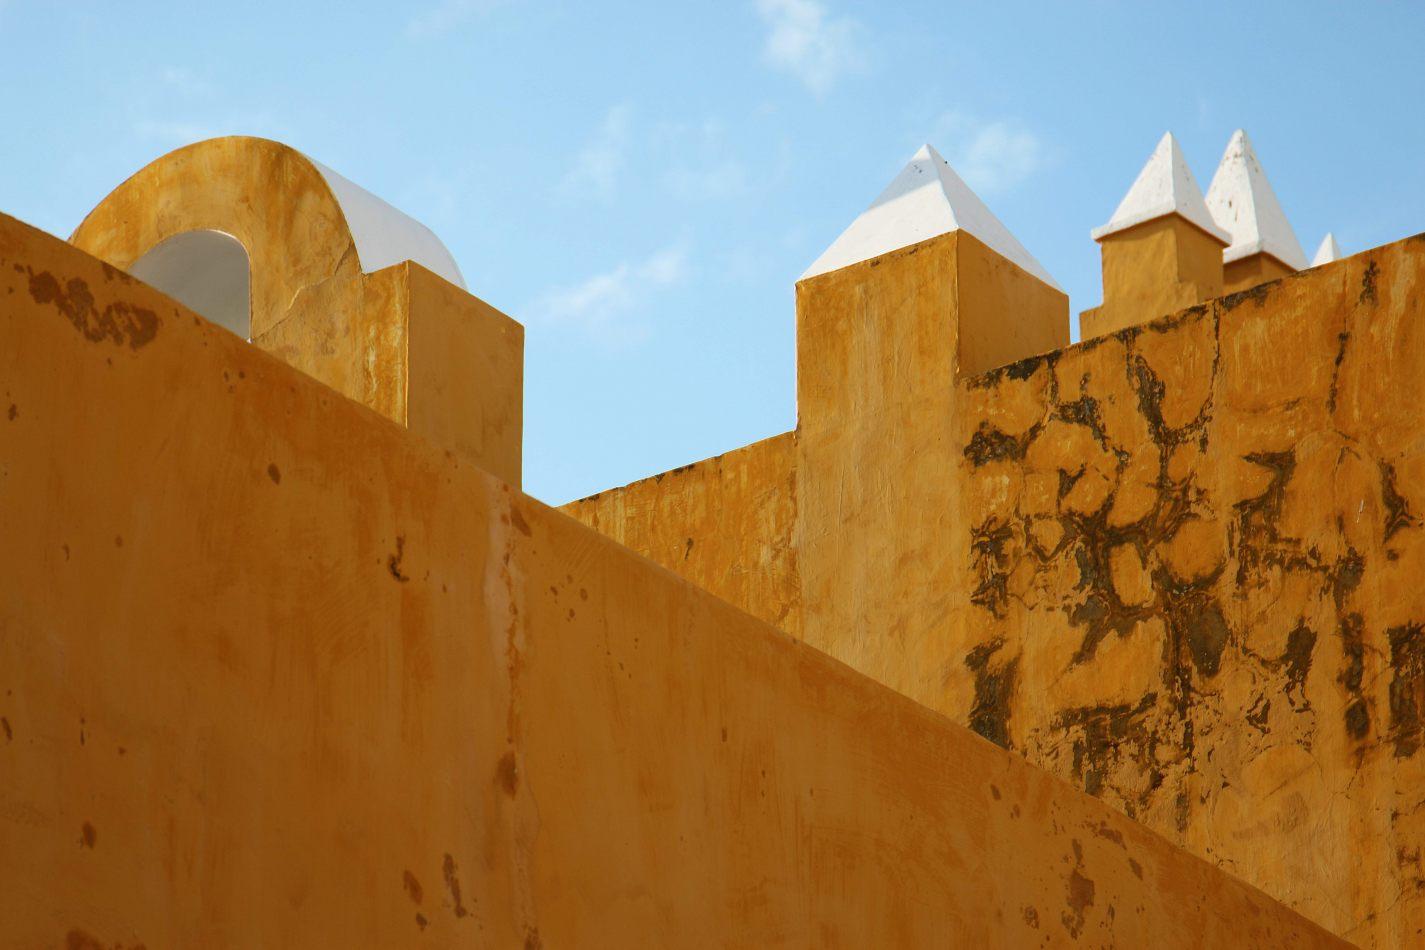 Anthony Ellis Photography: Small Sacrifices - Yellow Brick City